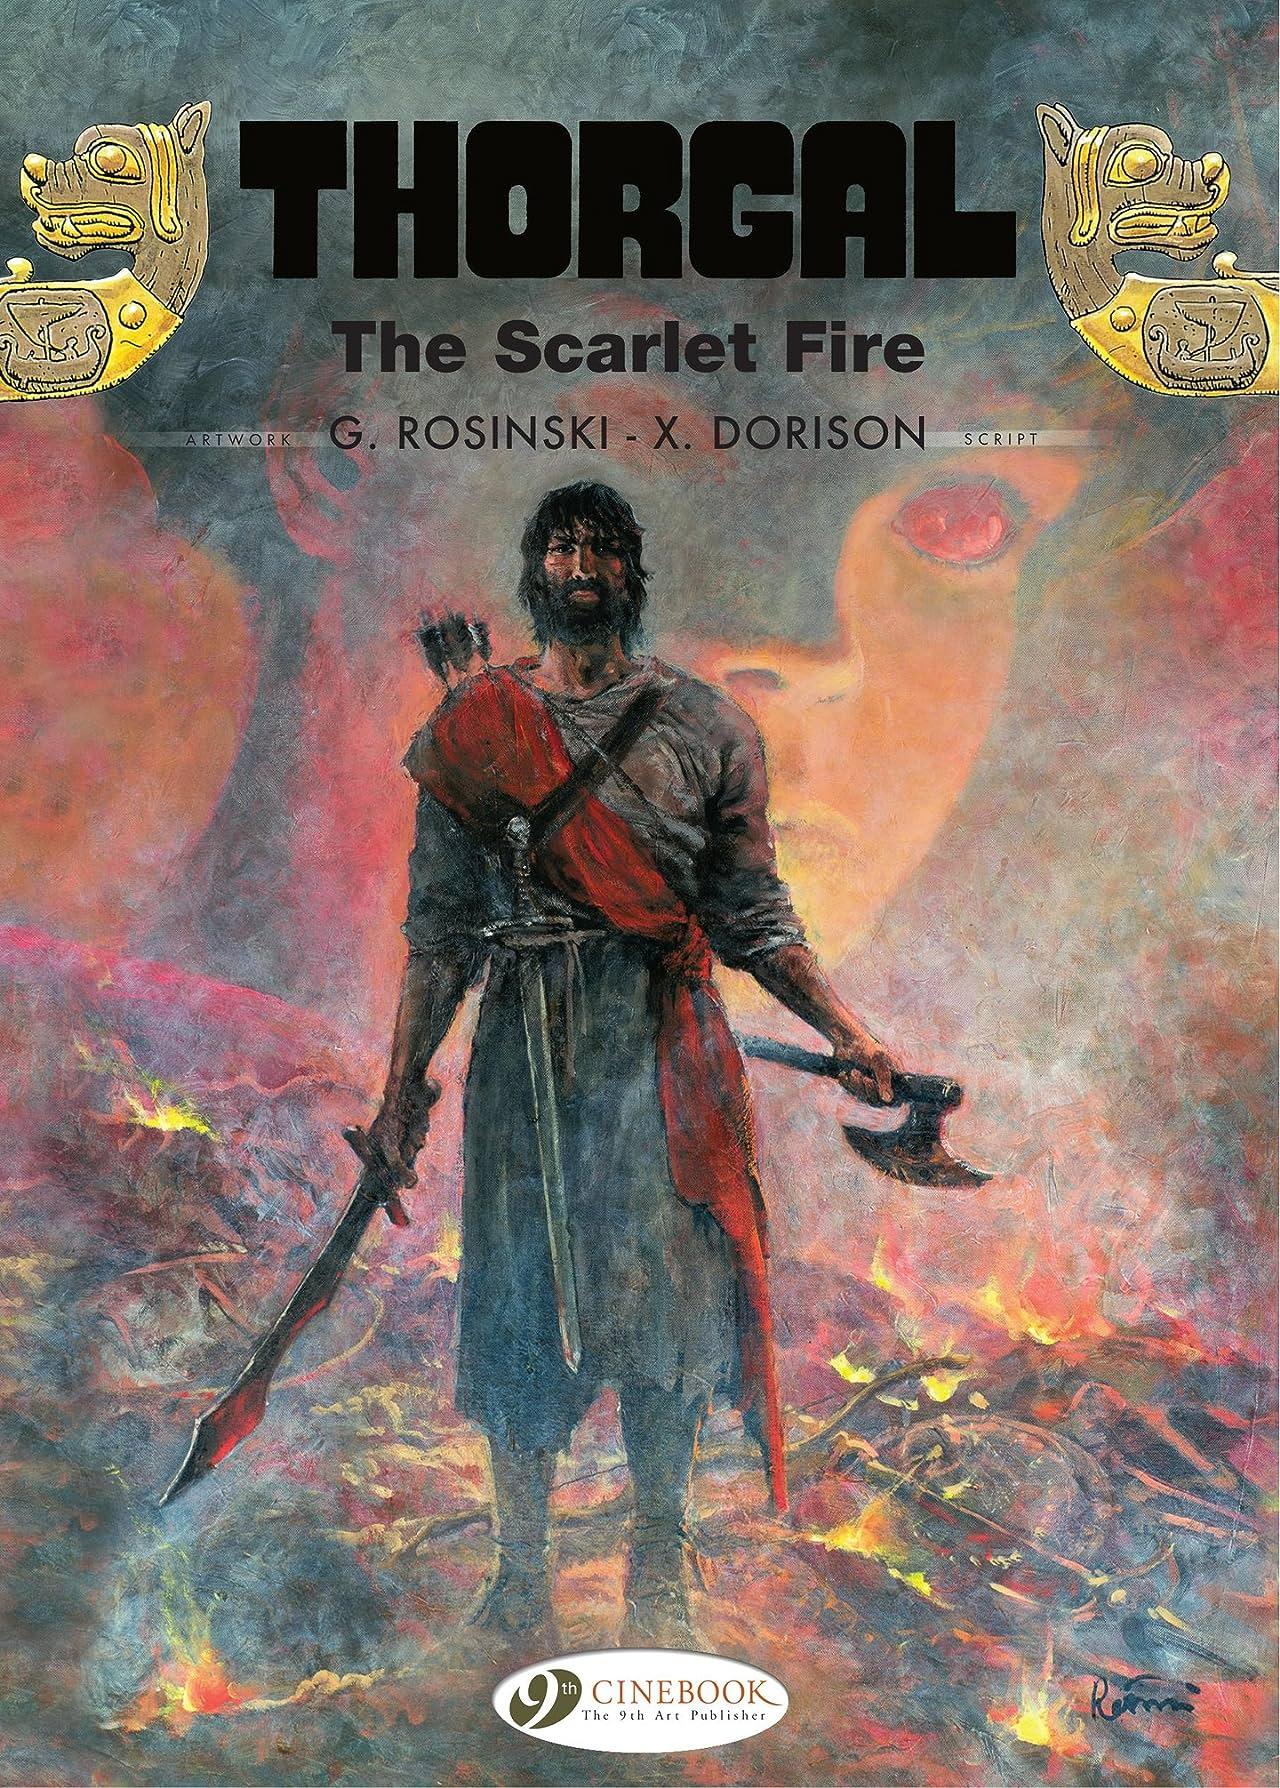 Thorgal Vol. 27: The Scarlet Fire